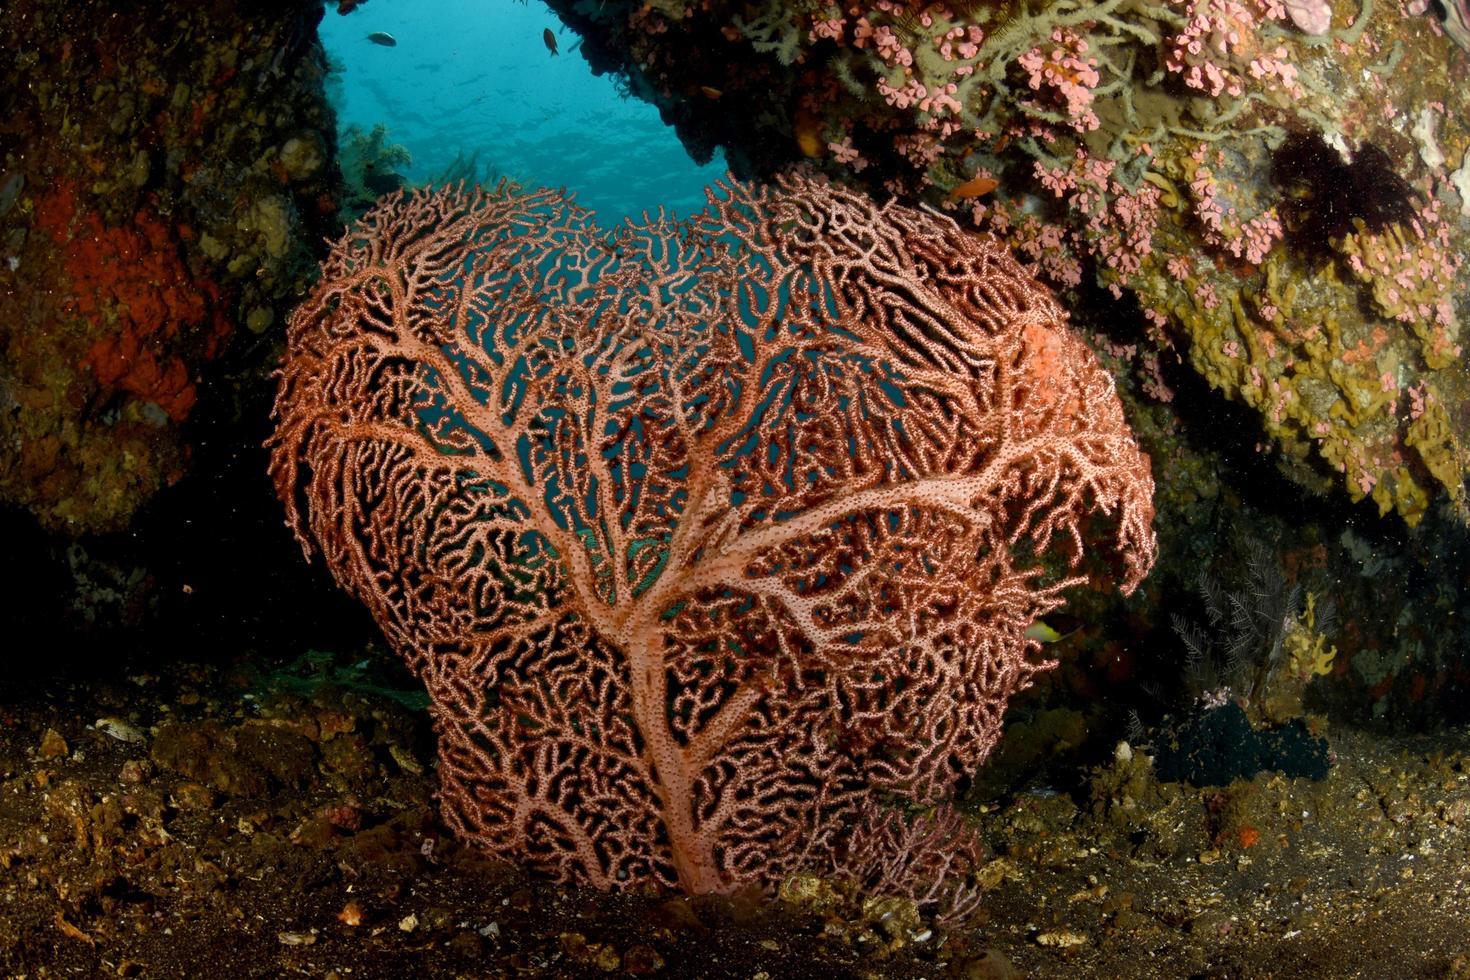 Amazing hard coral in Bali sea photo